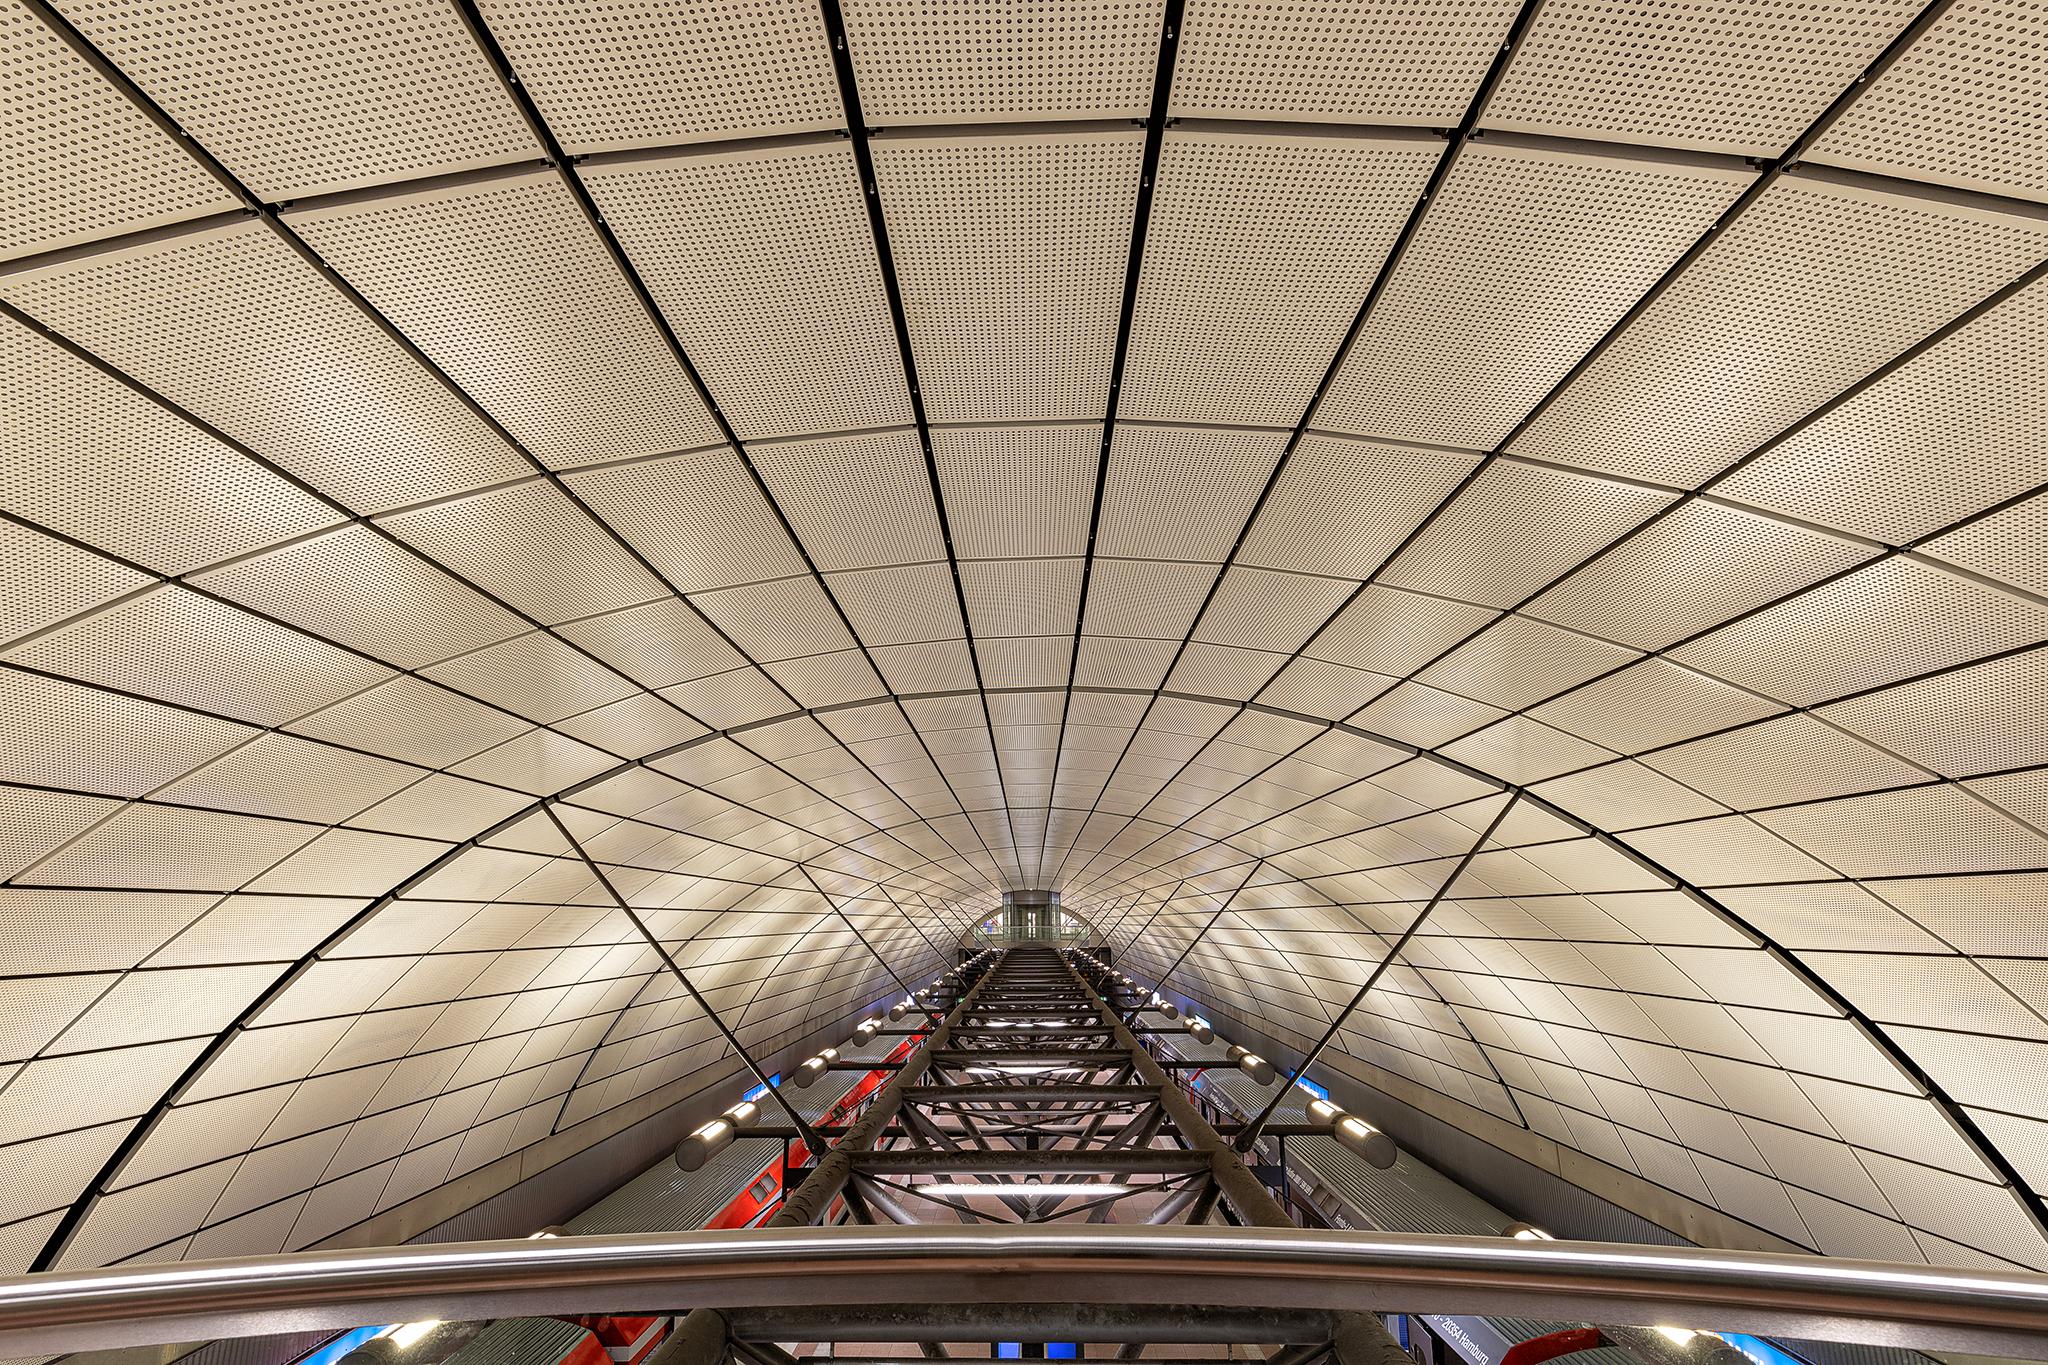 Train-Station Hamburg Airport, Germany